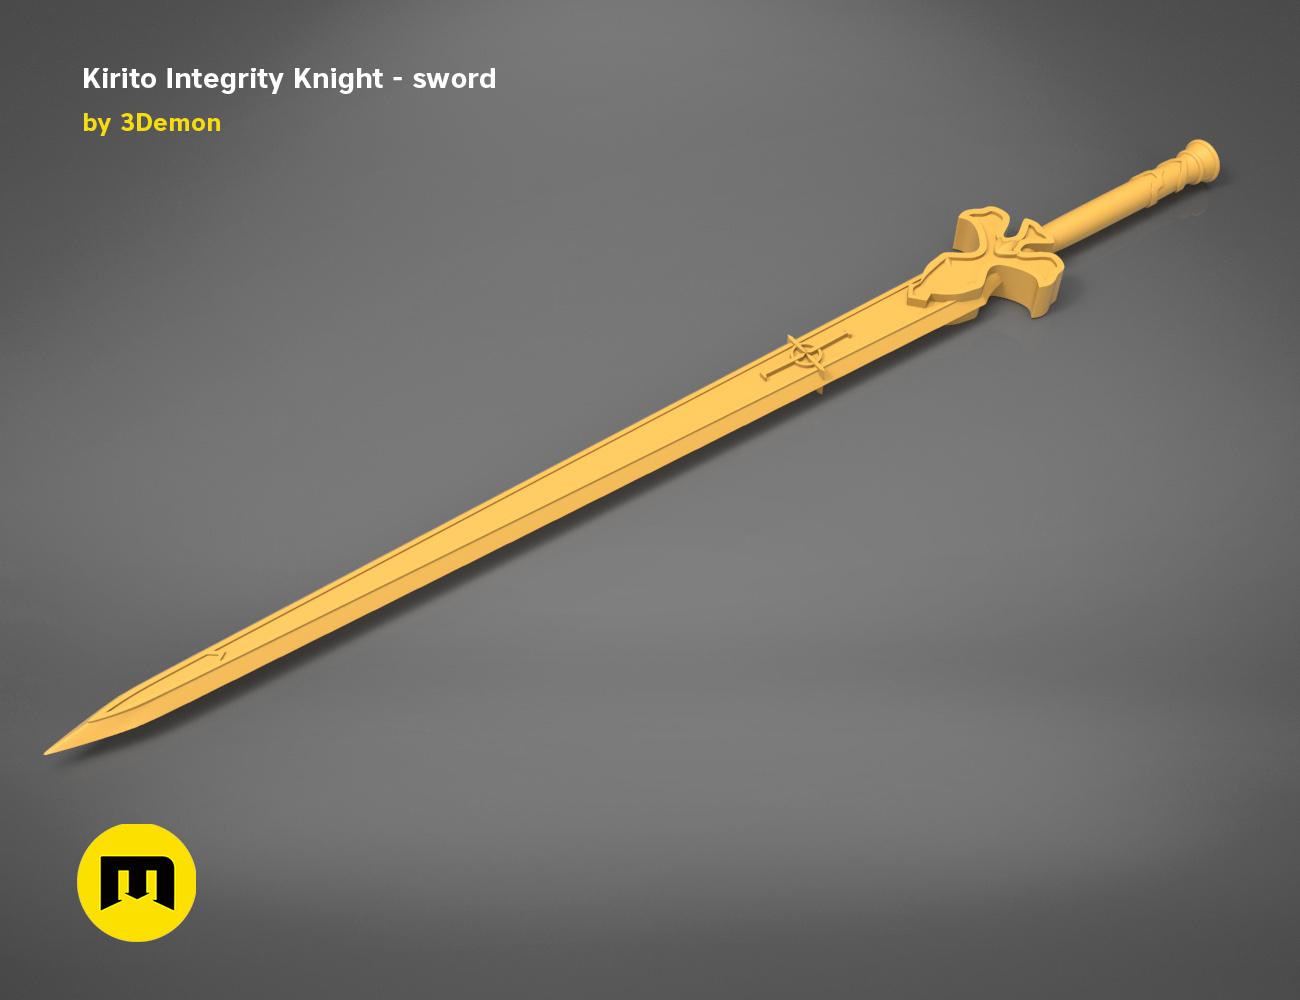 render_scene_Integrity-knight-sword-basic.16 kopie.jpg Download STL file Kirito's Sword - Integrity Knight • 3D print model, 3D-mon